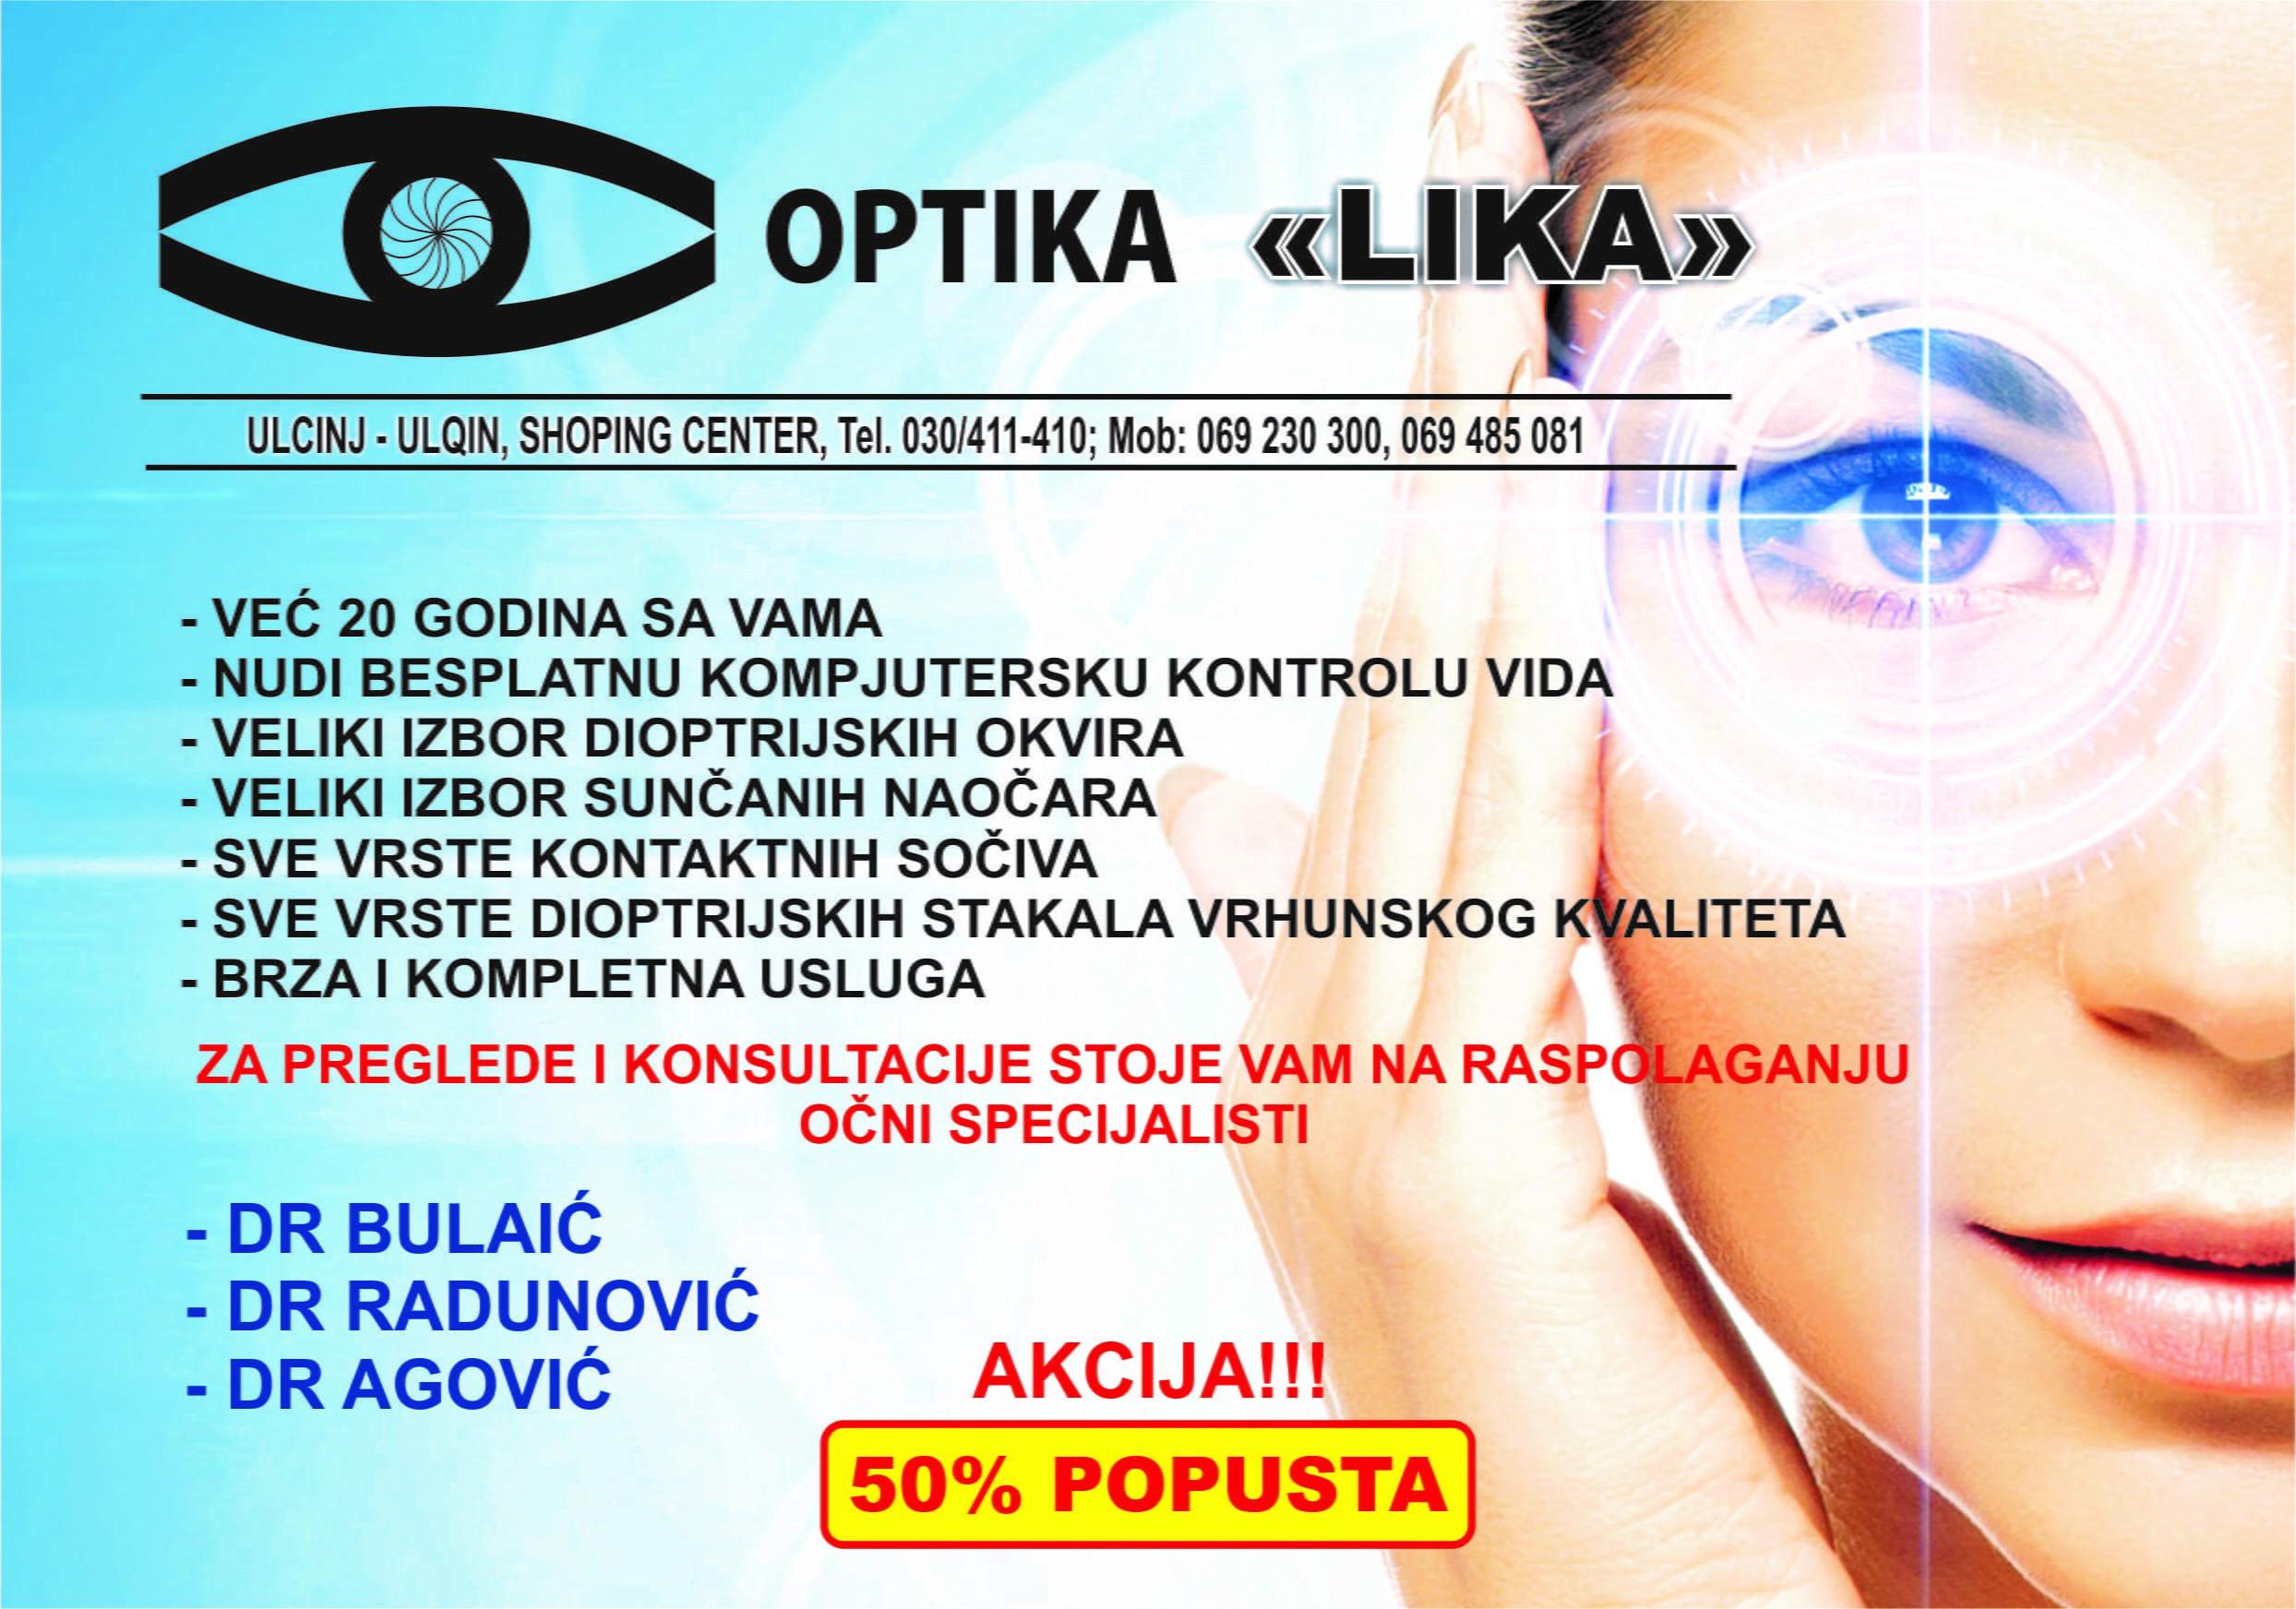 Optika Lika